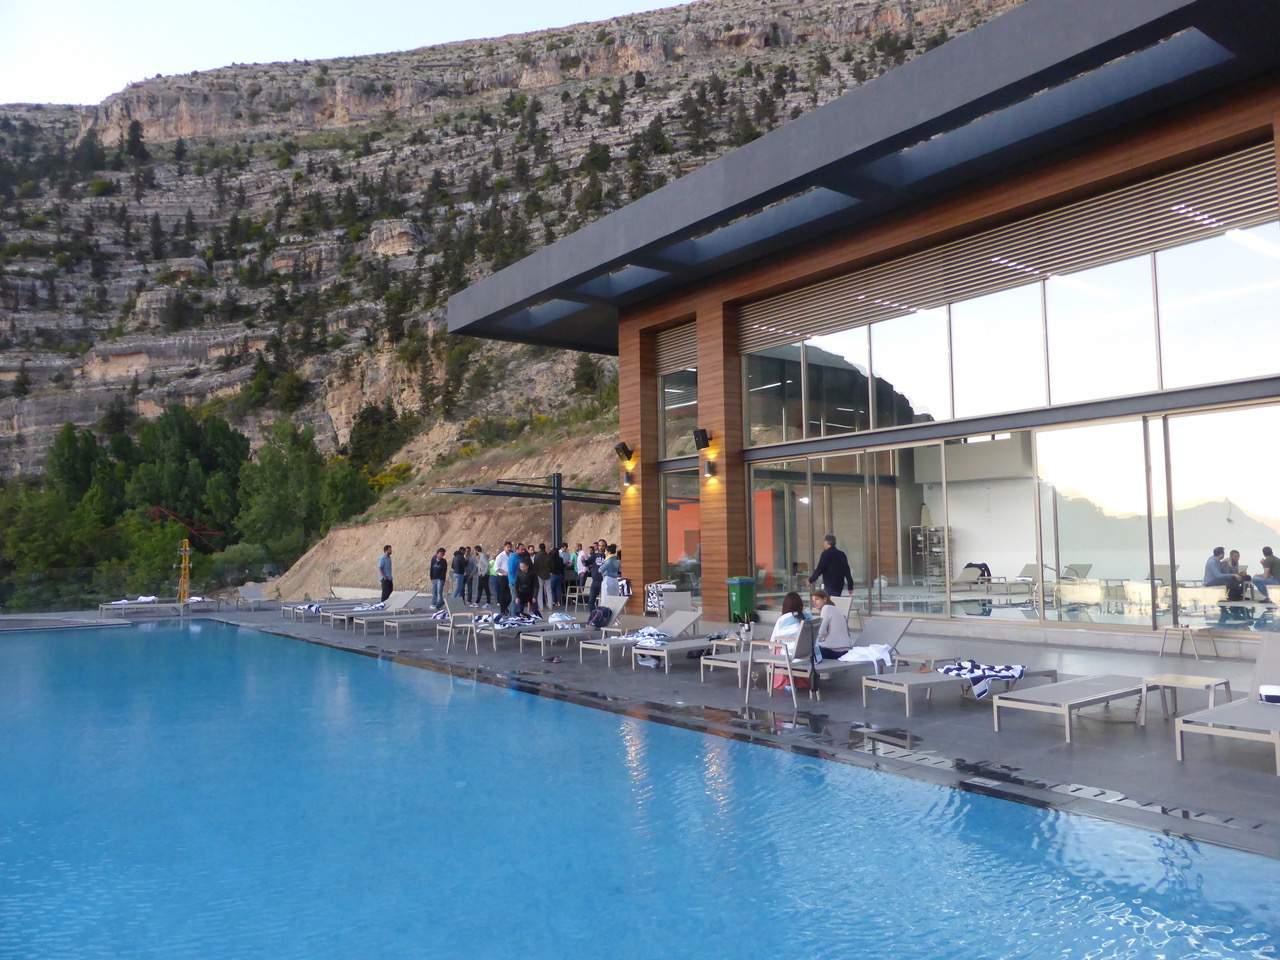 Pool at Mist Hotel, Ehden, Beirut